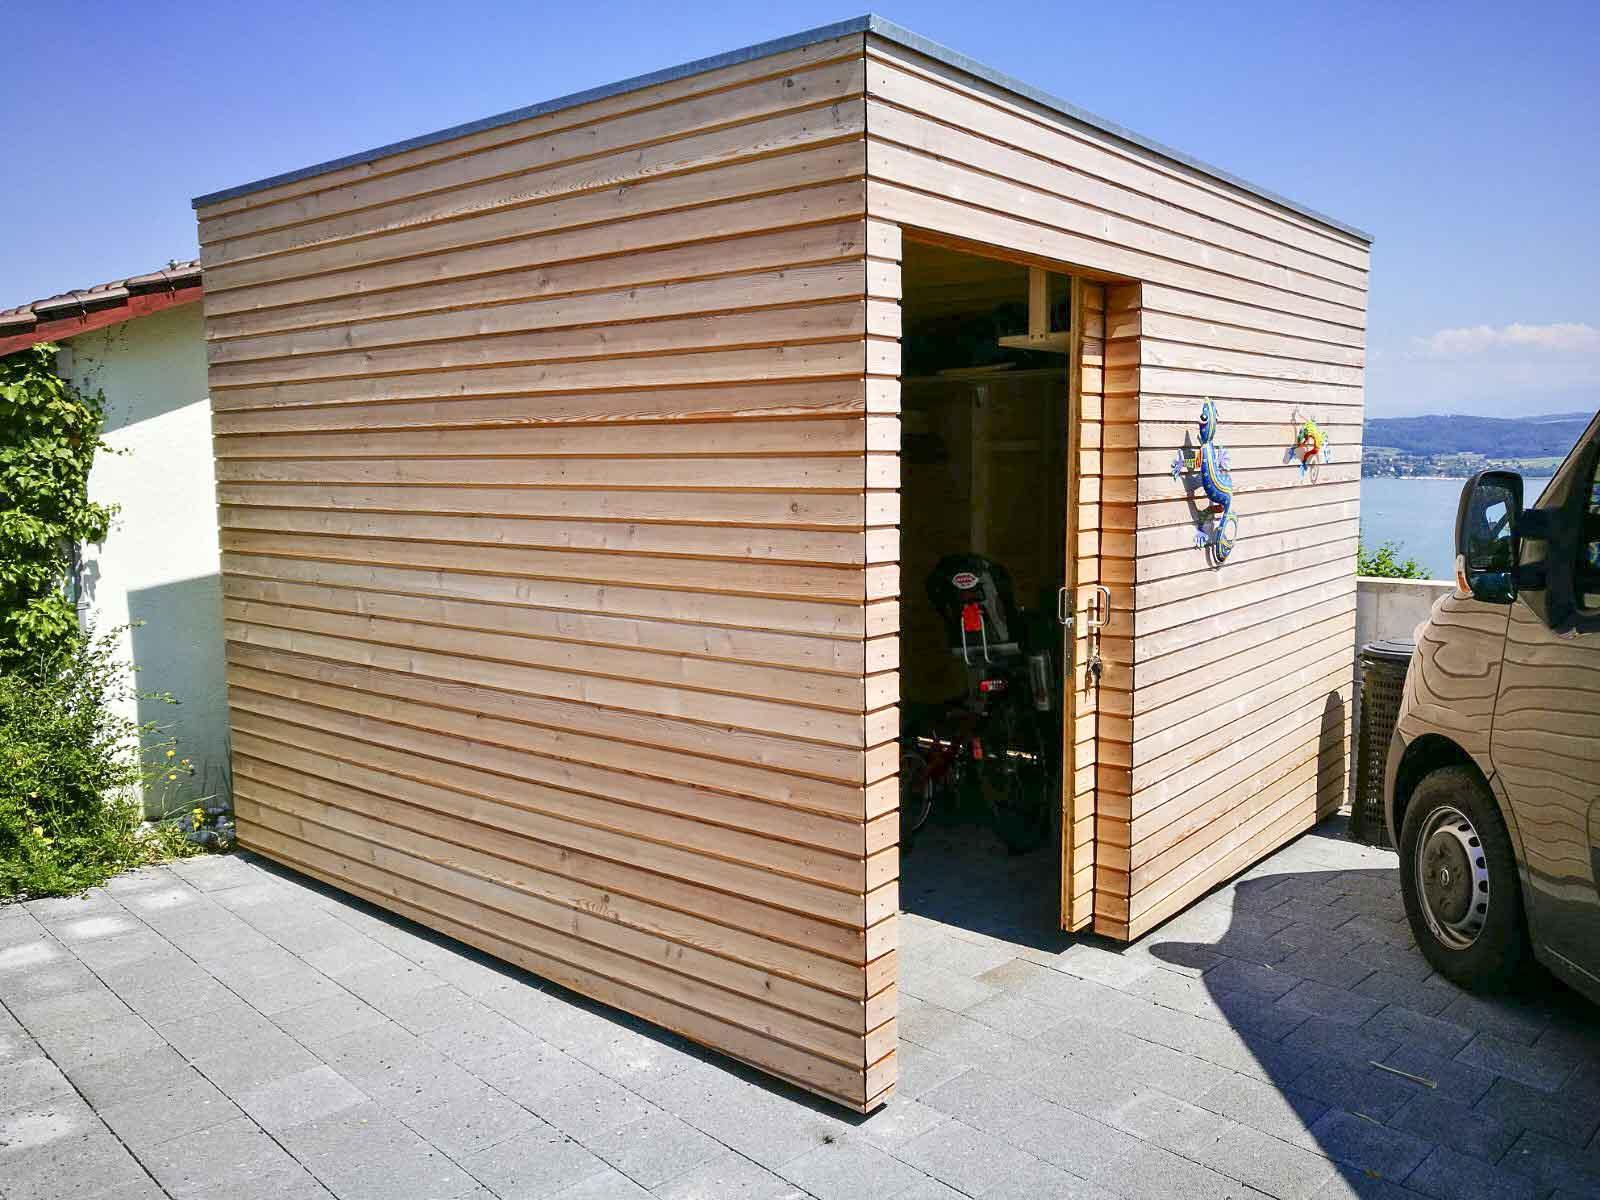 Wooddesign_Terrassengestaltung_Veounterstand_Carport_Lärchenholz vergraut_Holzverschalung_Schiebetüre-Flachdach (4)